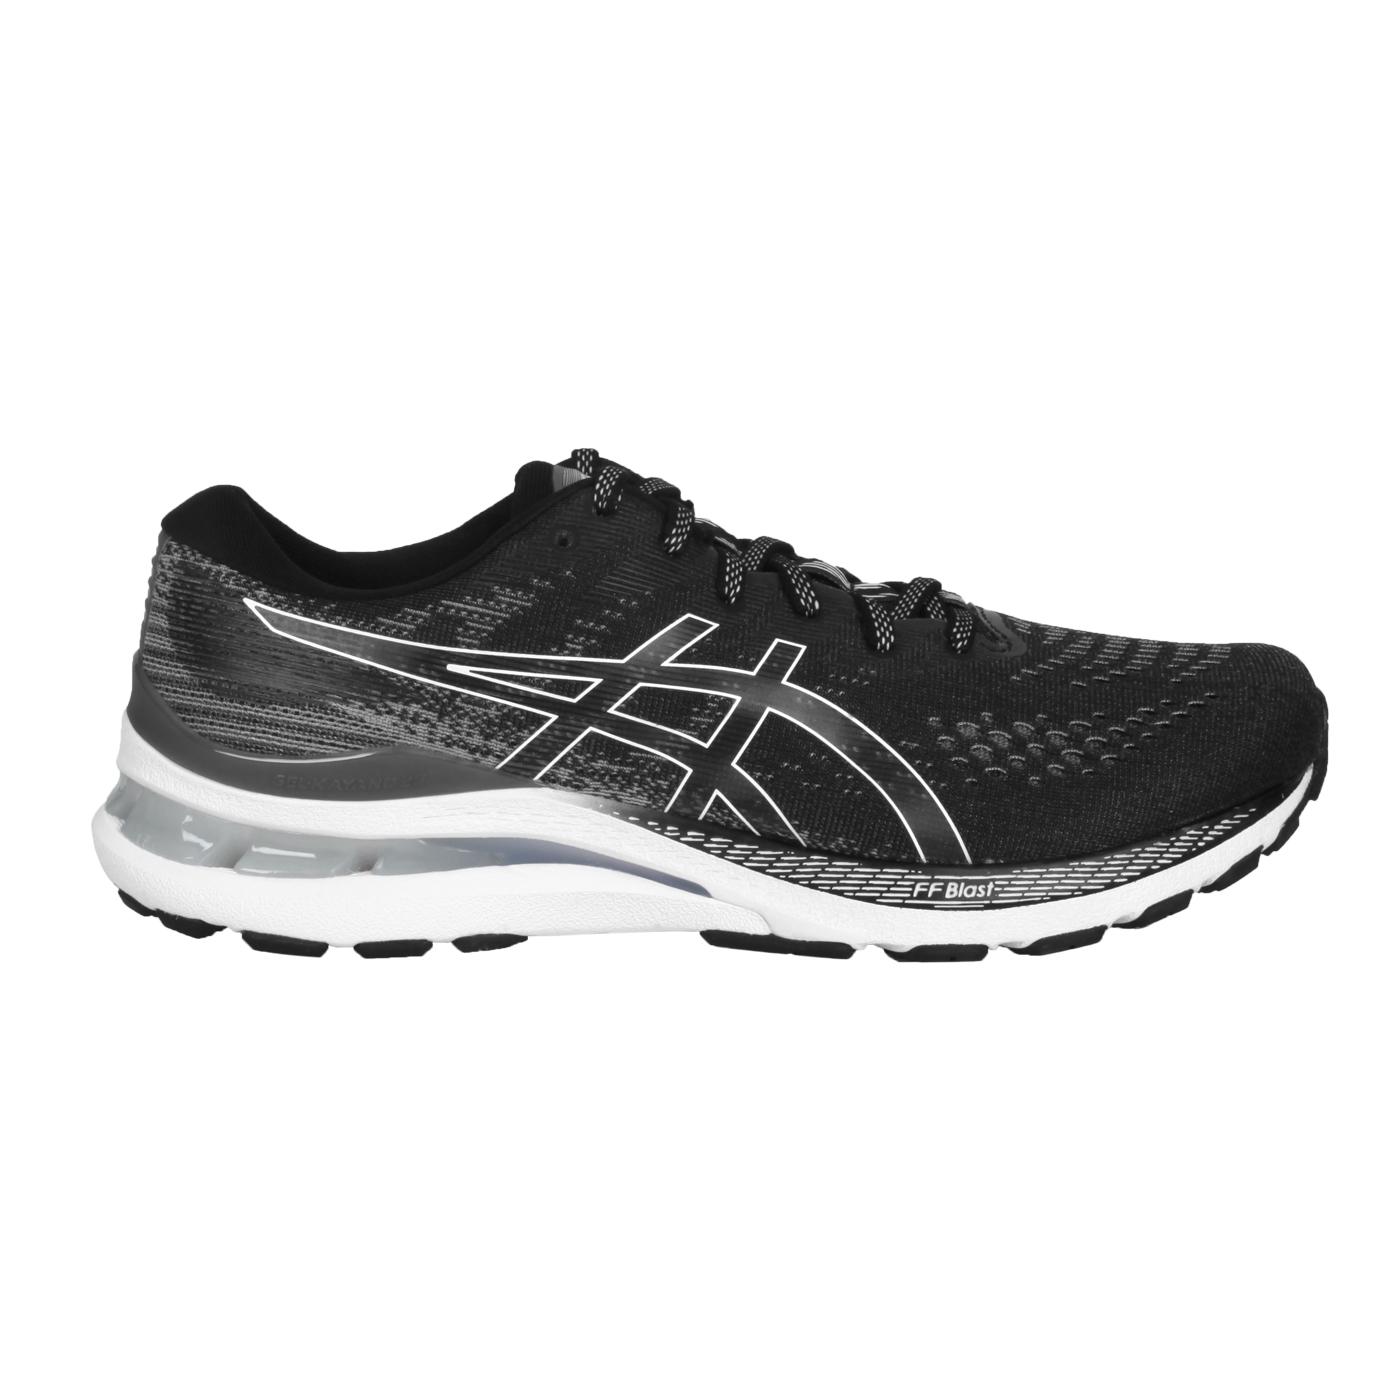 ASICS 男款慢跑鞋-2E  @GEL-KAYANO 28@1011B188-003